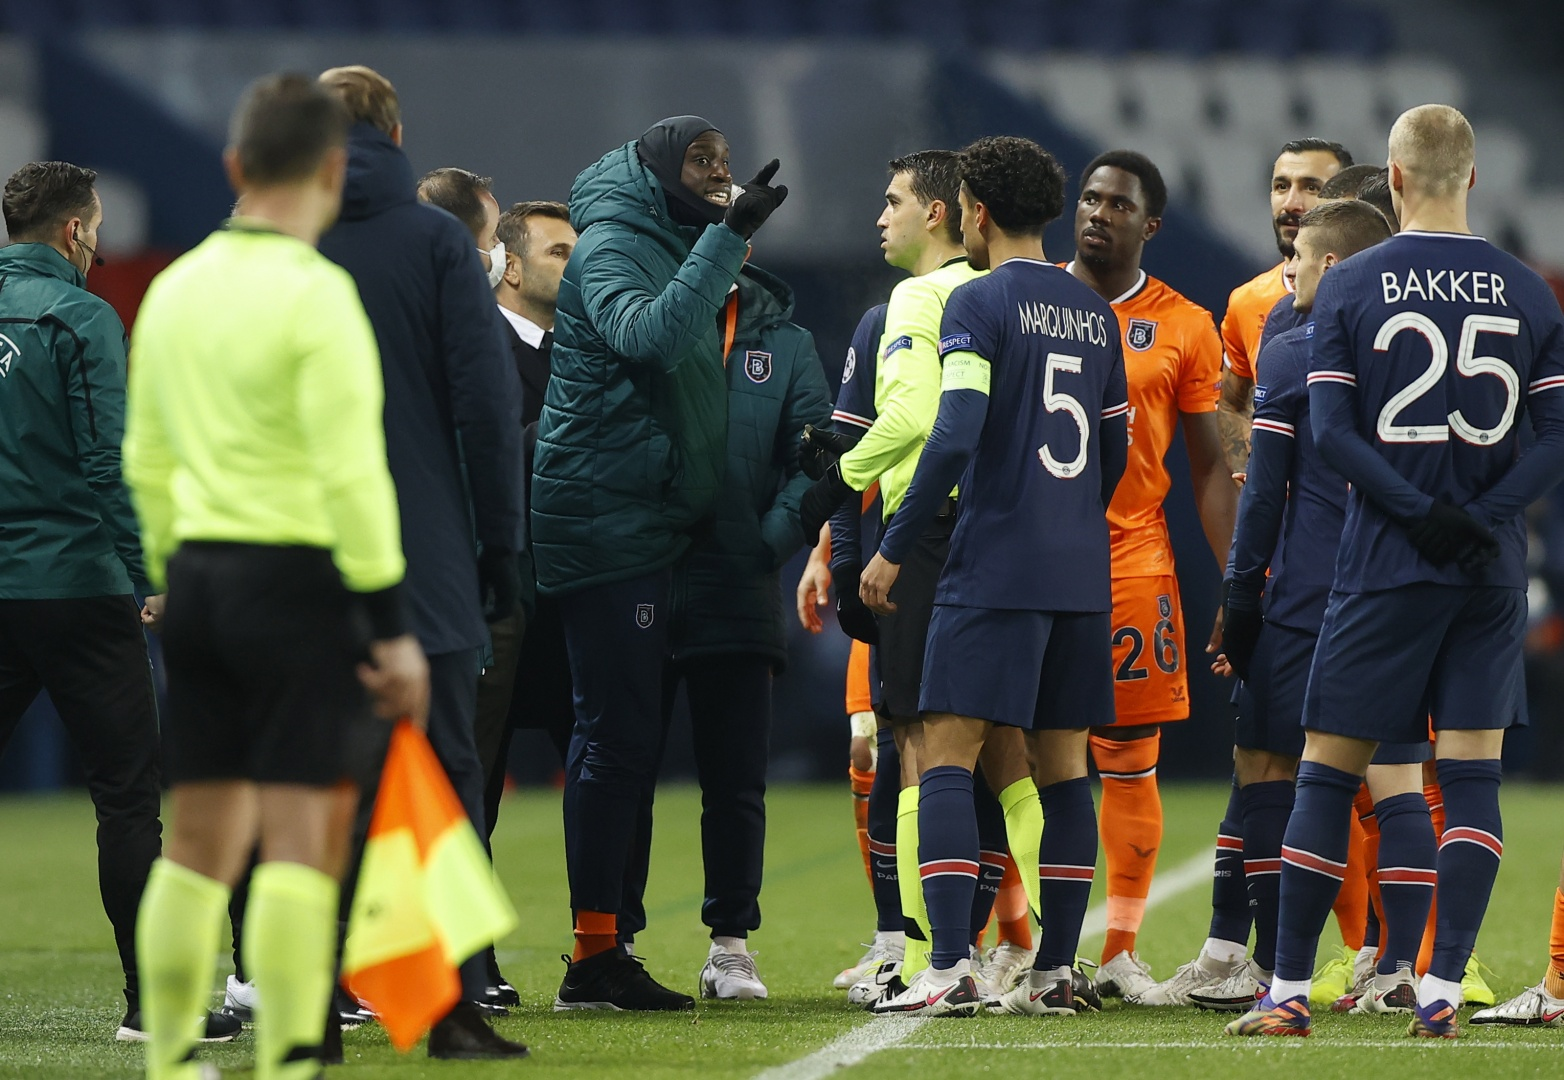 Paris Saint-Germain-Basaksehir interrompido por alegado insulto racista